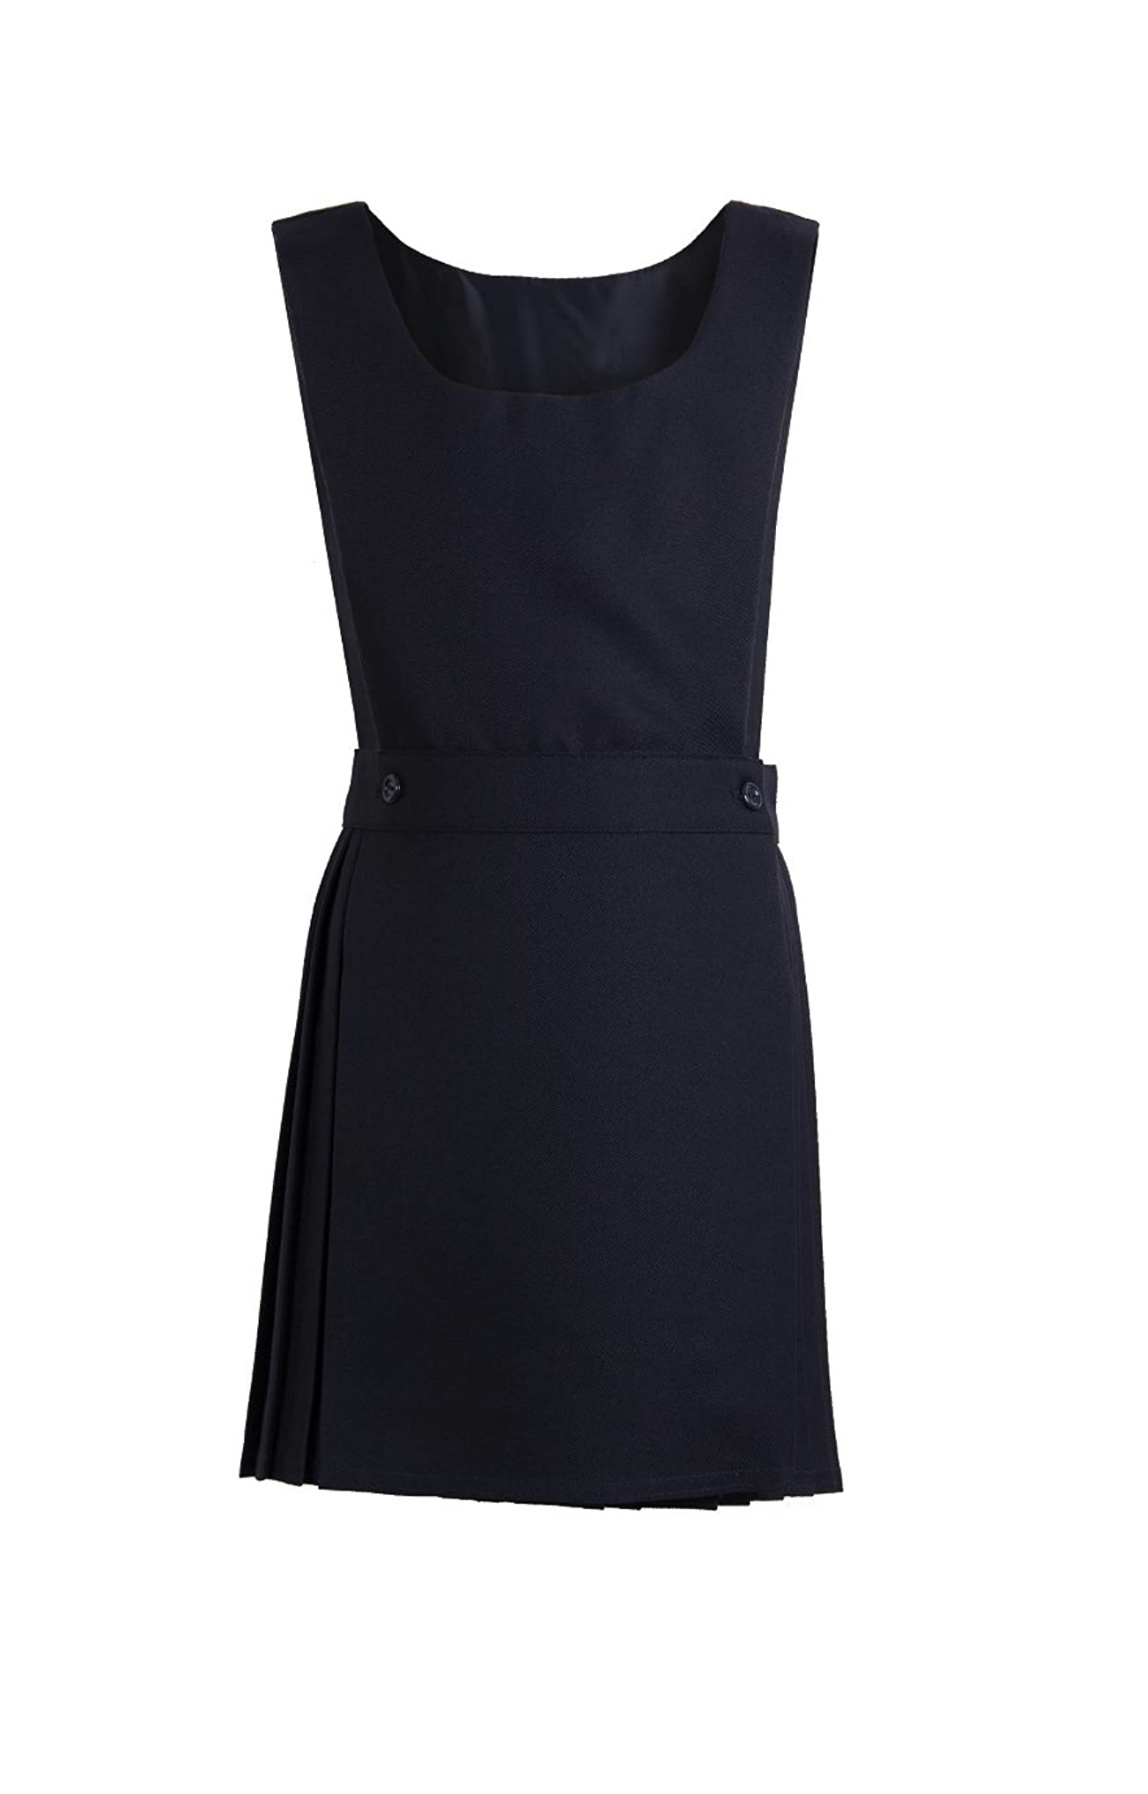 Pex Pinafore Pex Black Kilt Style Pinafore